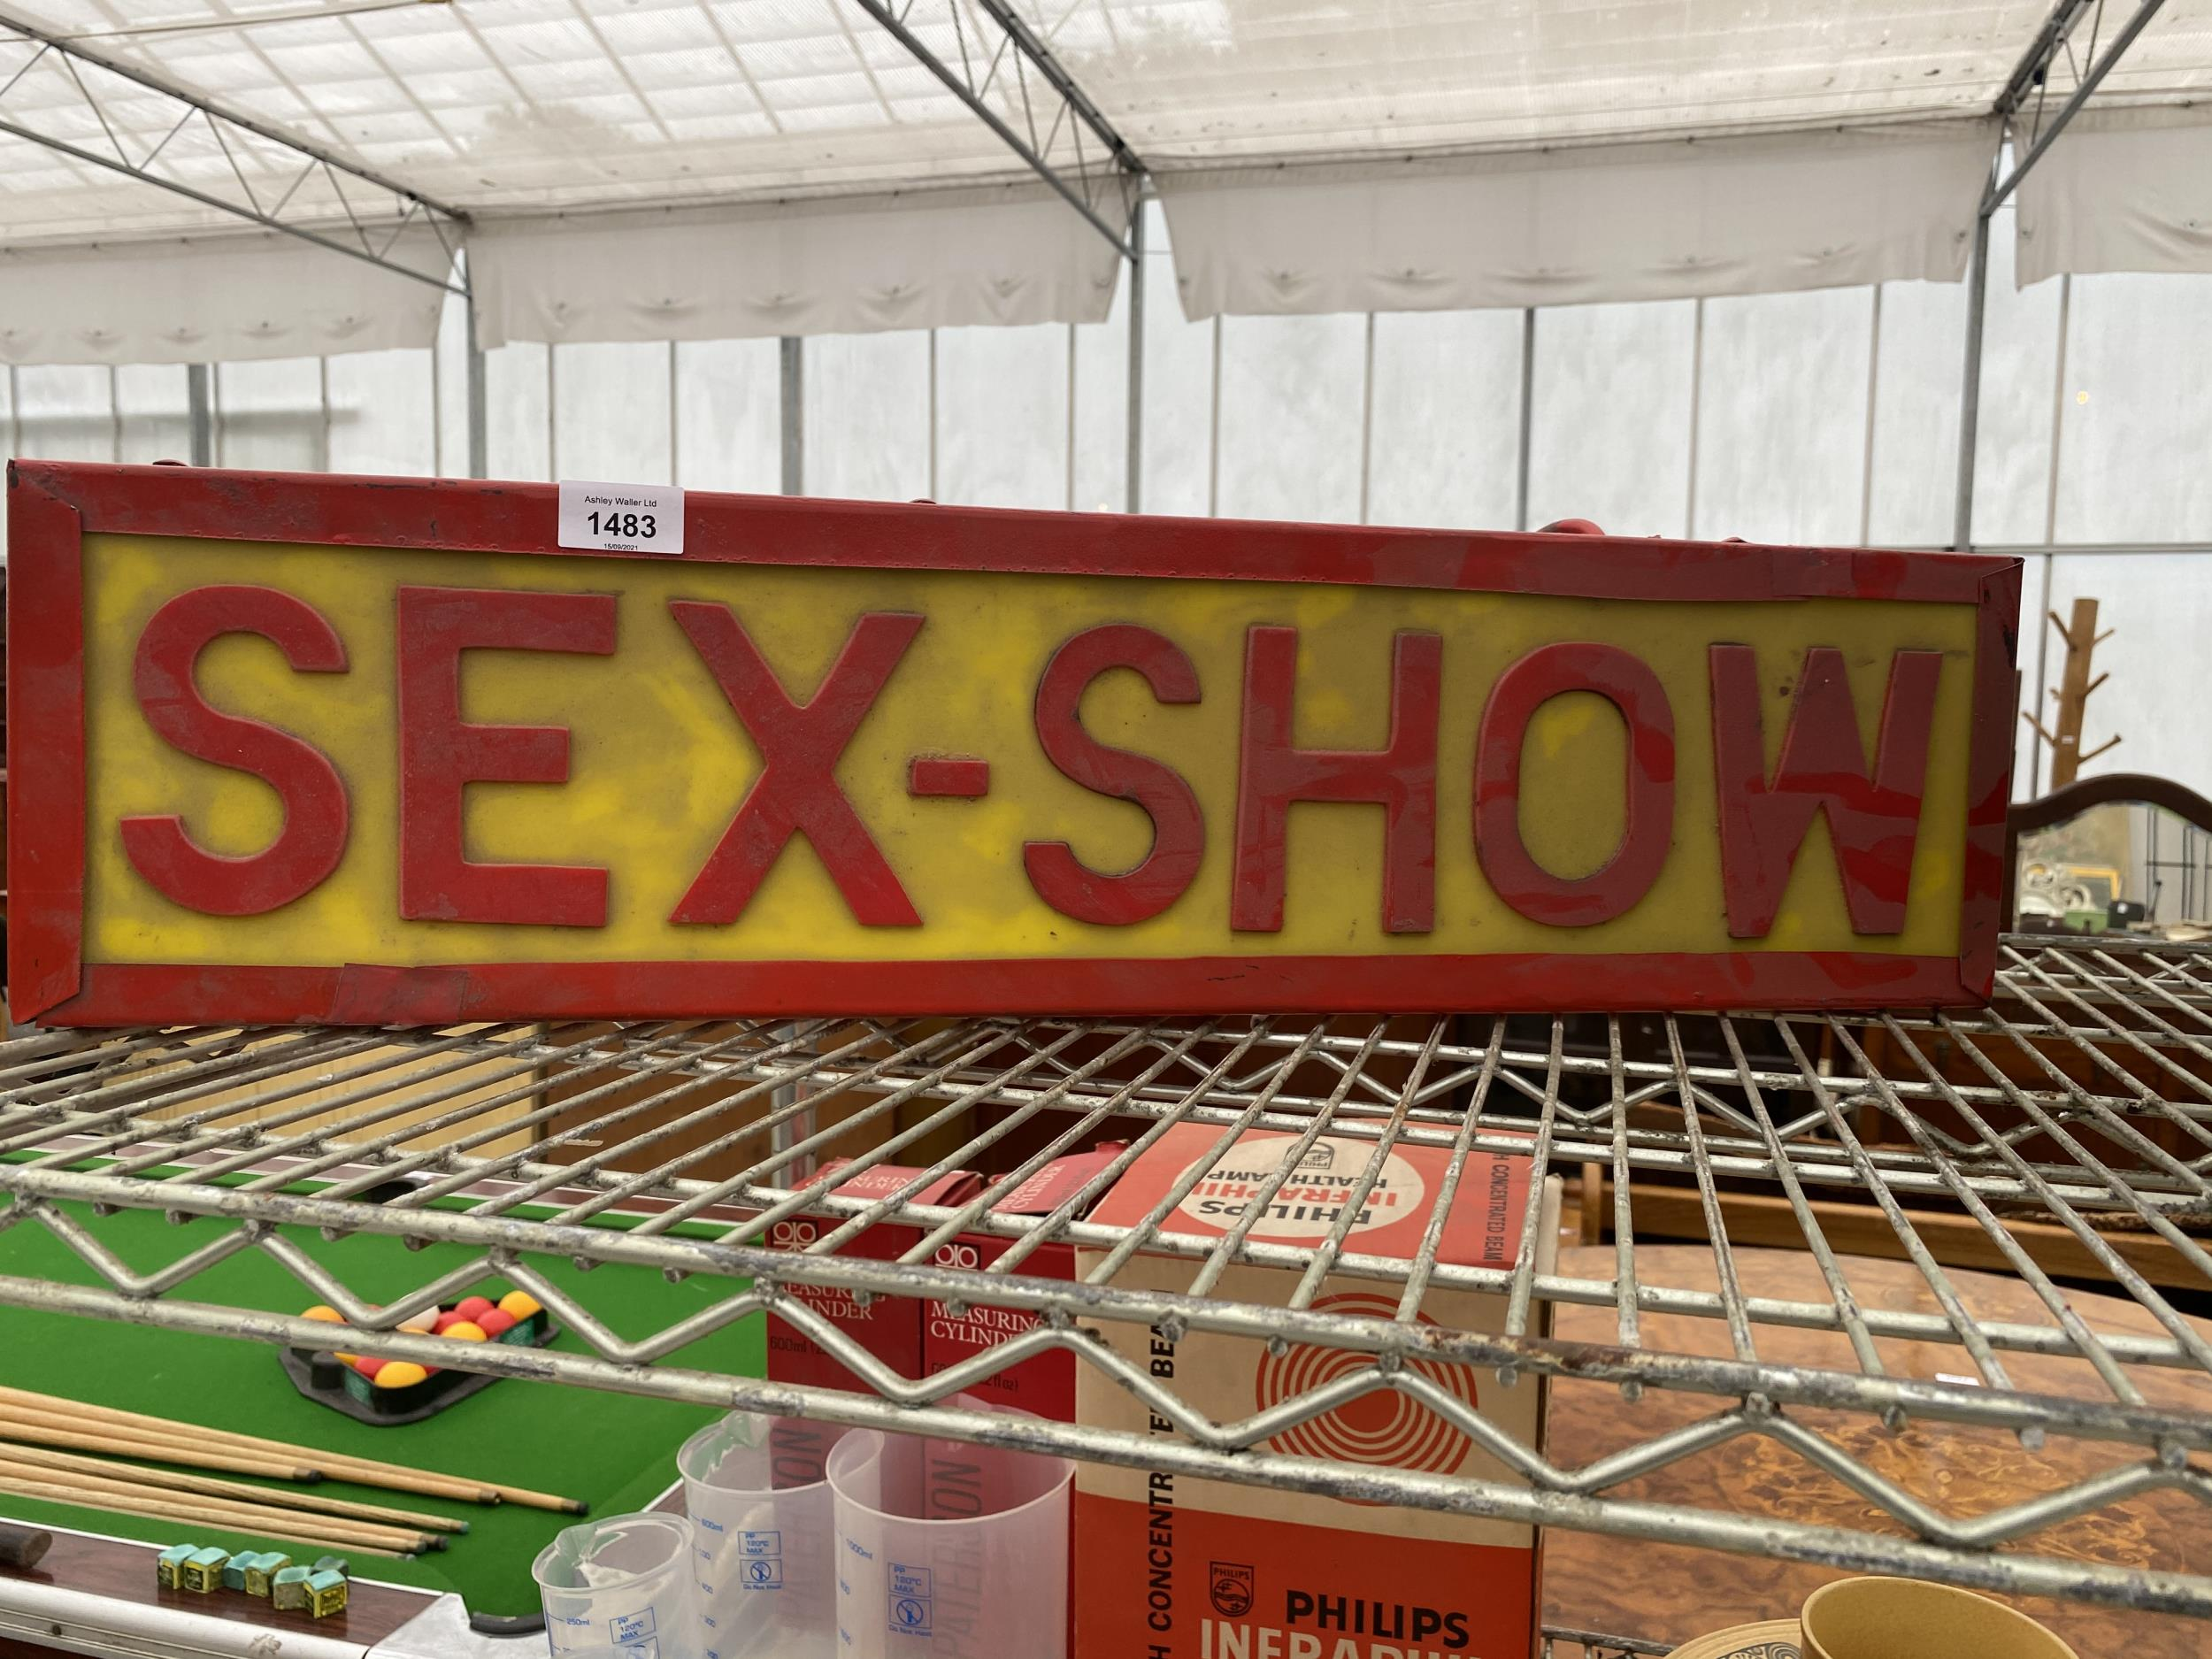 AN ILLUMINATED 'SEX-SHOW' SIGN